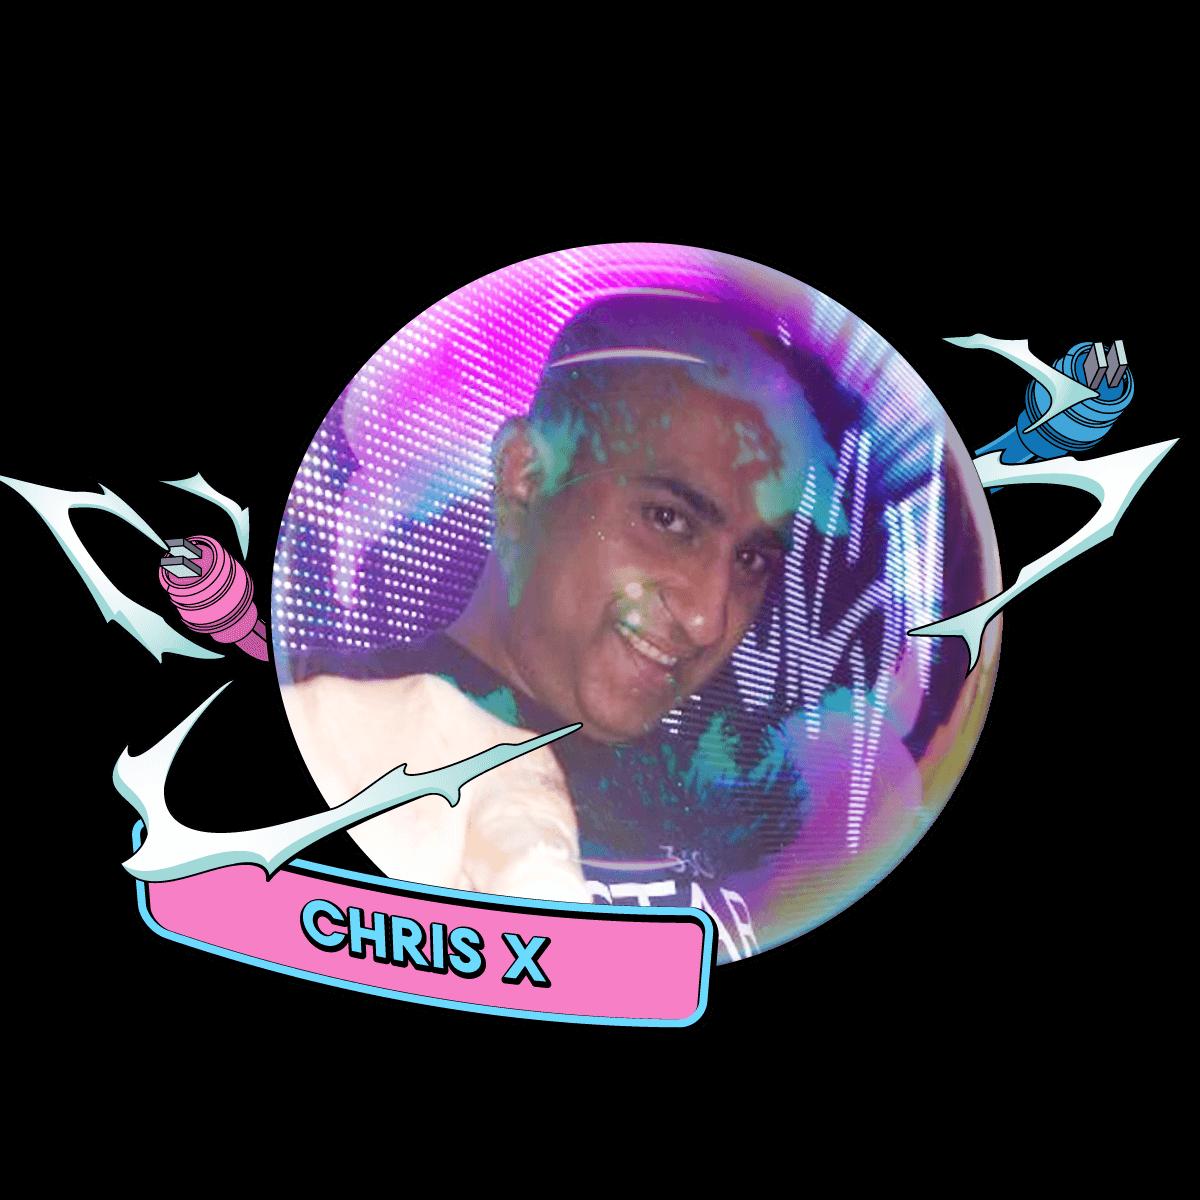 Chris X